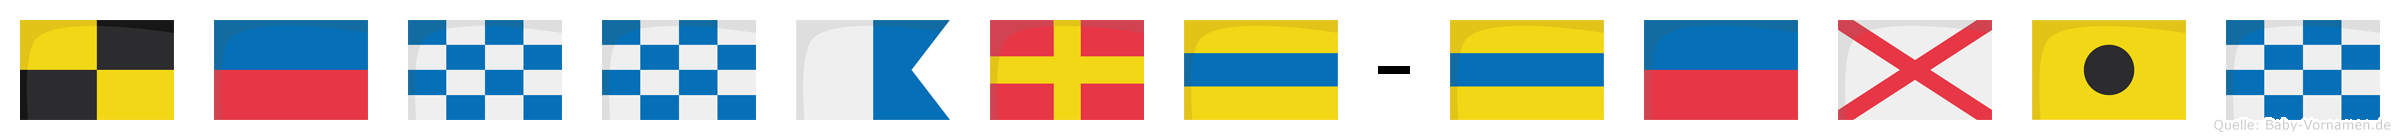 Lennard-Devin im Flaggenalphabet